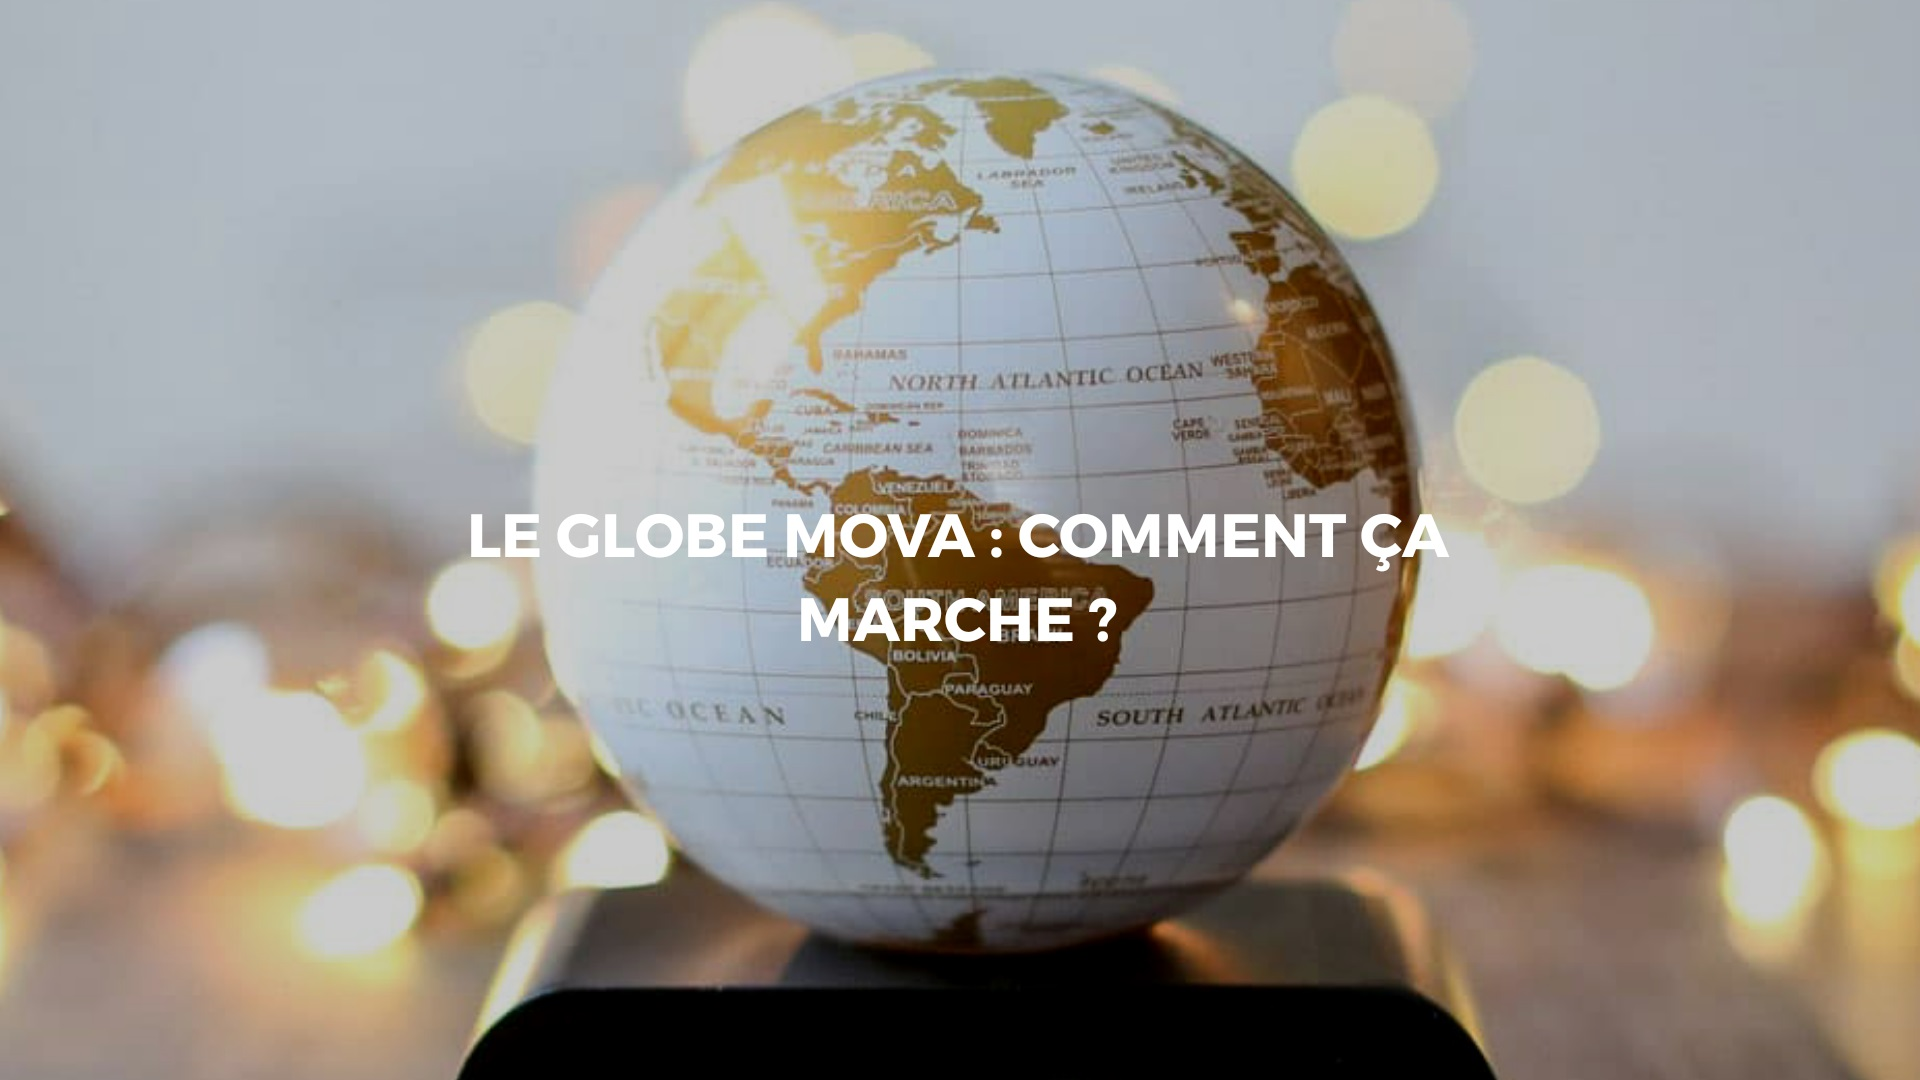 Les Mova Globe